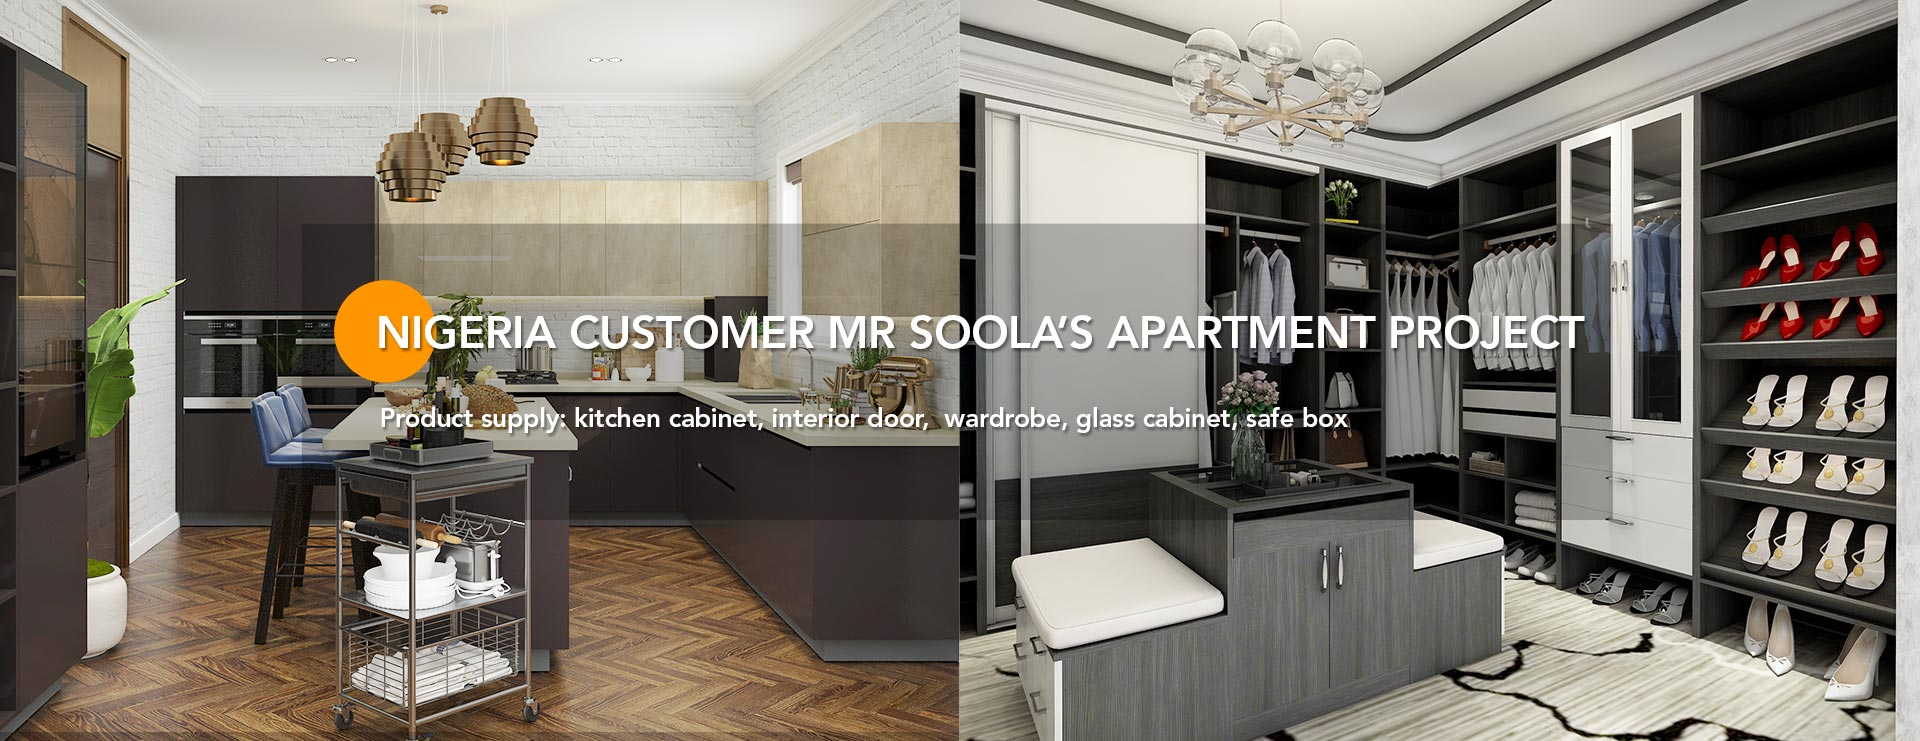 nigeria-customer-mr-soolas-apartment-project-01